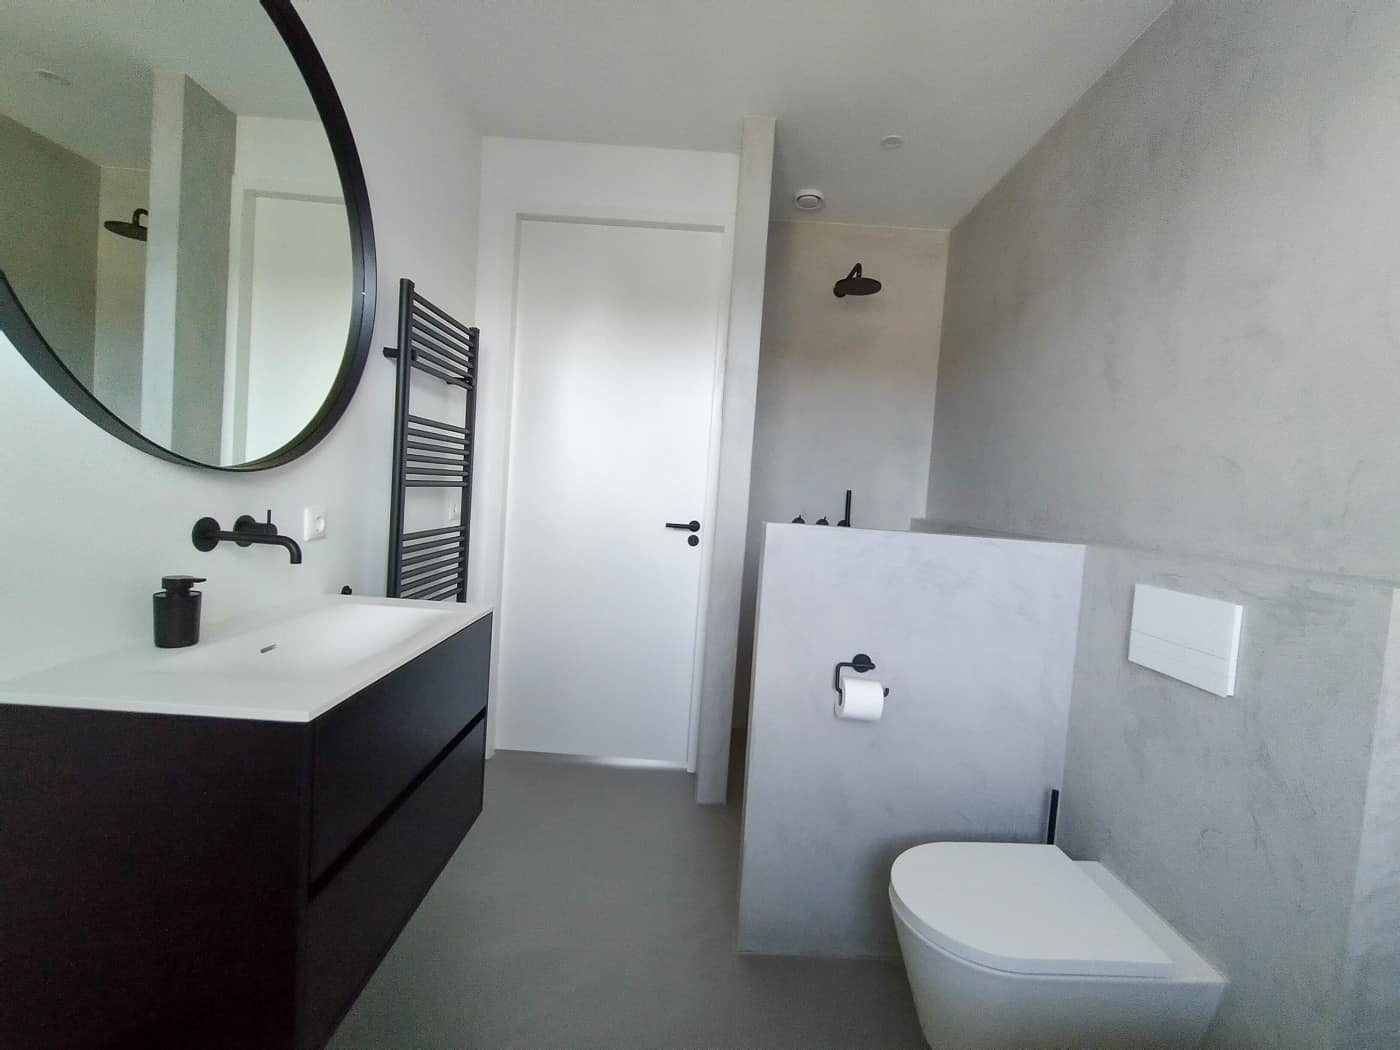 Ongebruikt Beton ciré badkamer Ede • Stuctuur QH-94